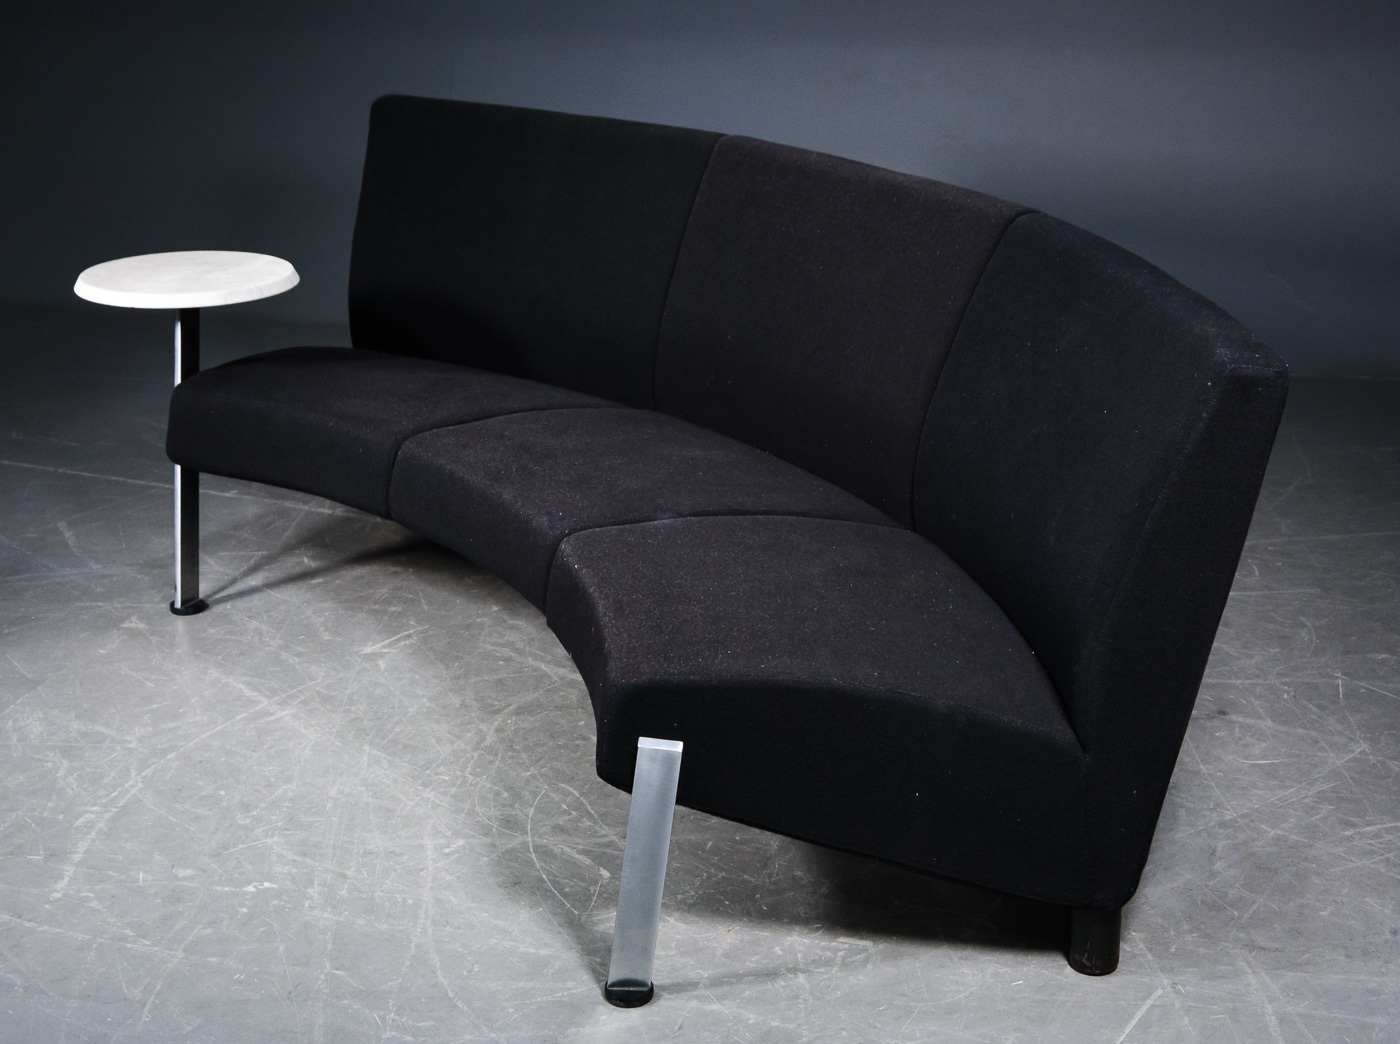 Vintage Sofa, Fritz Hansen Decision - Pelican Design